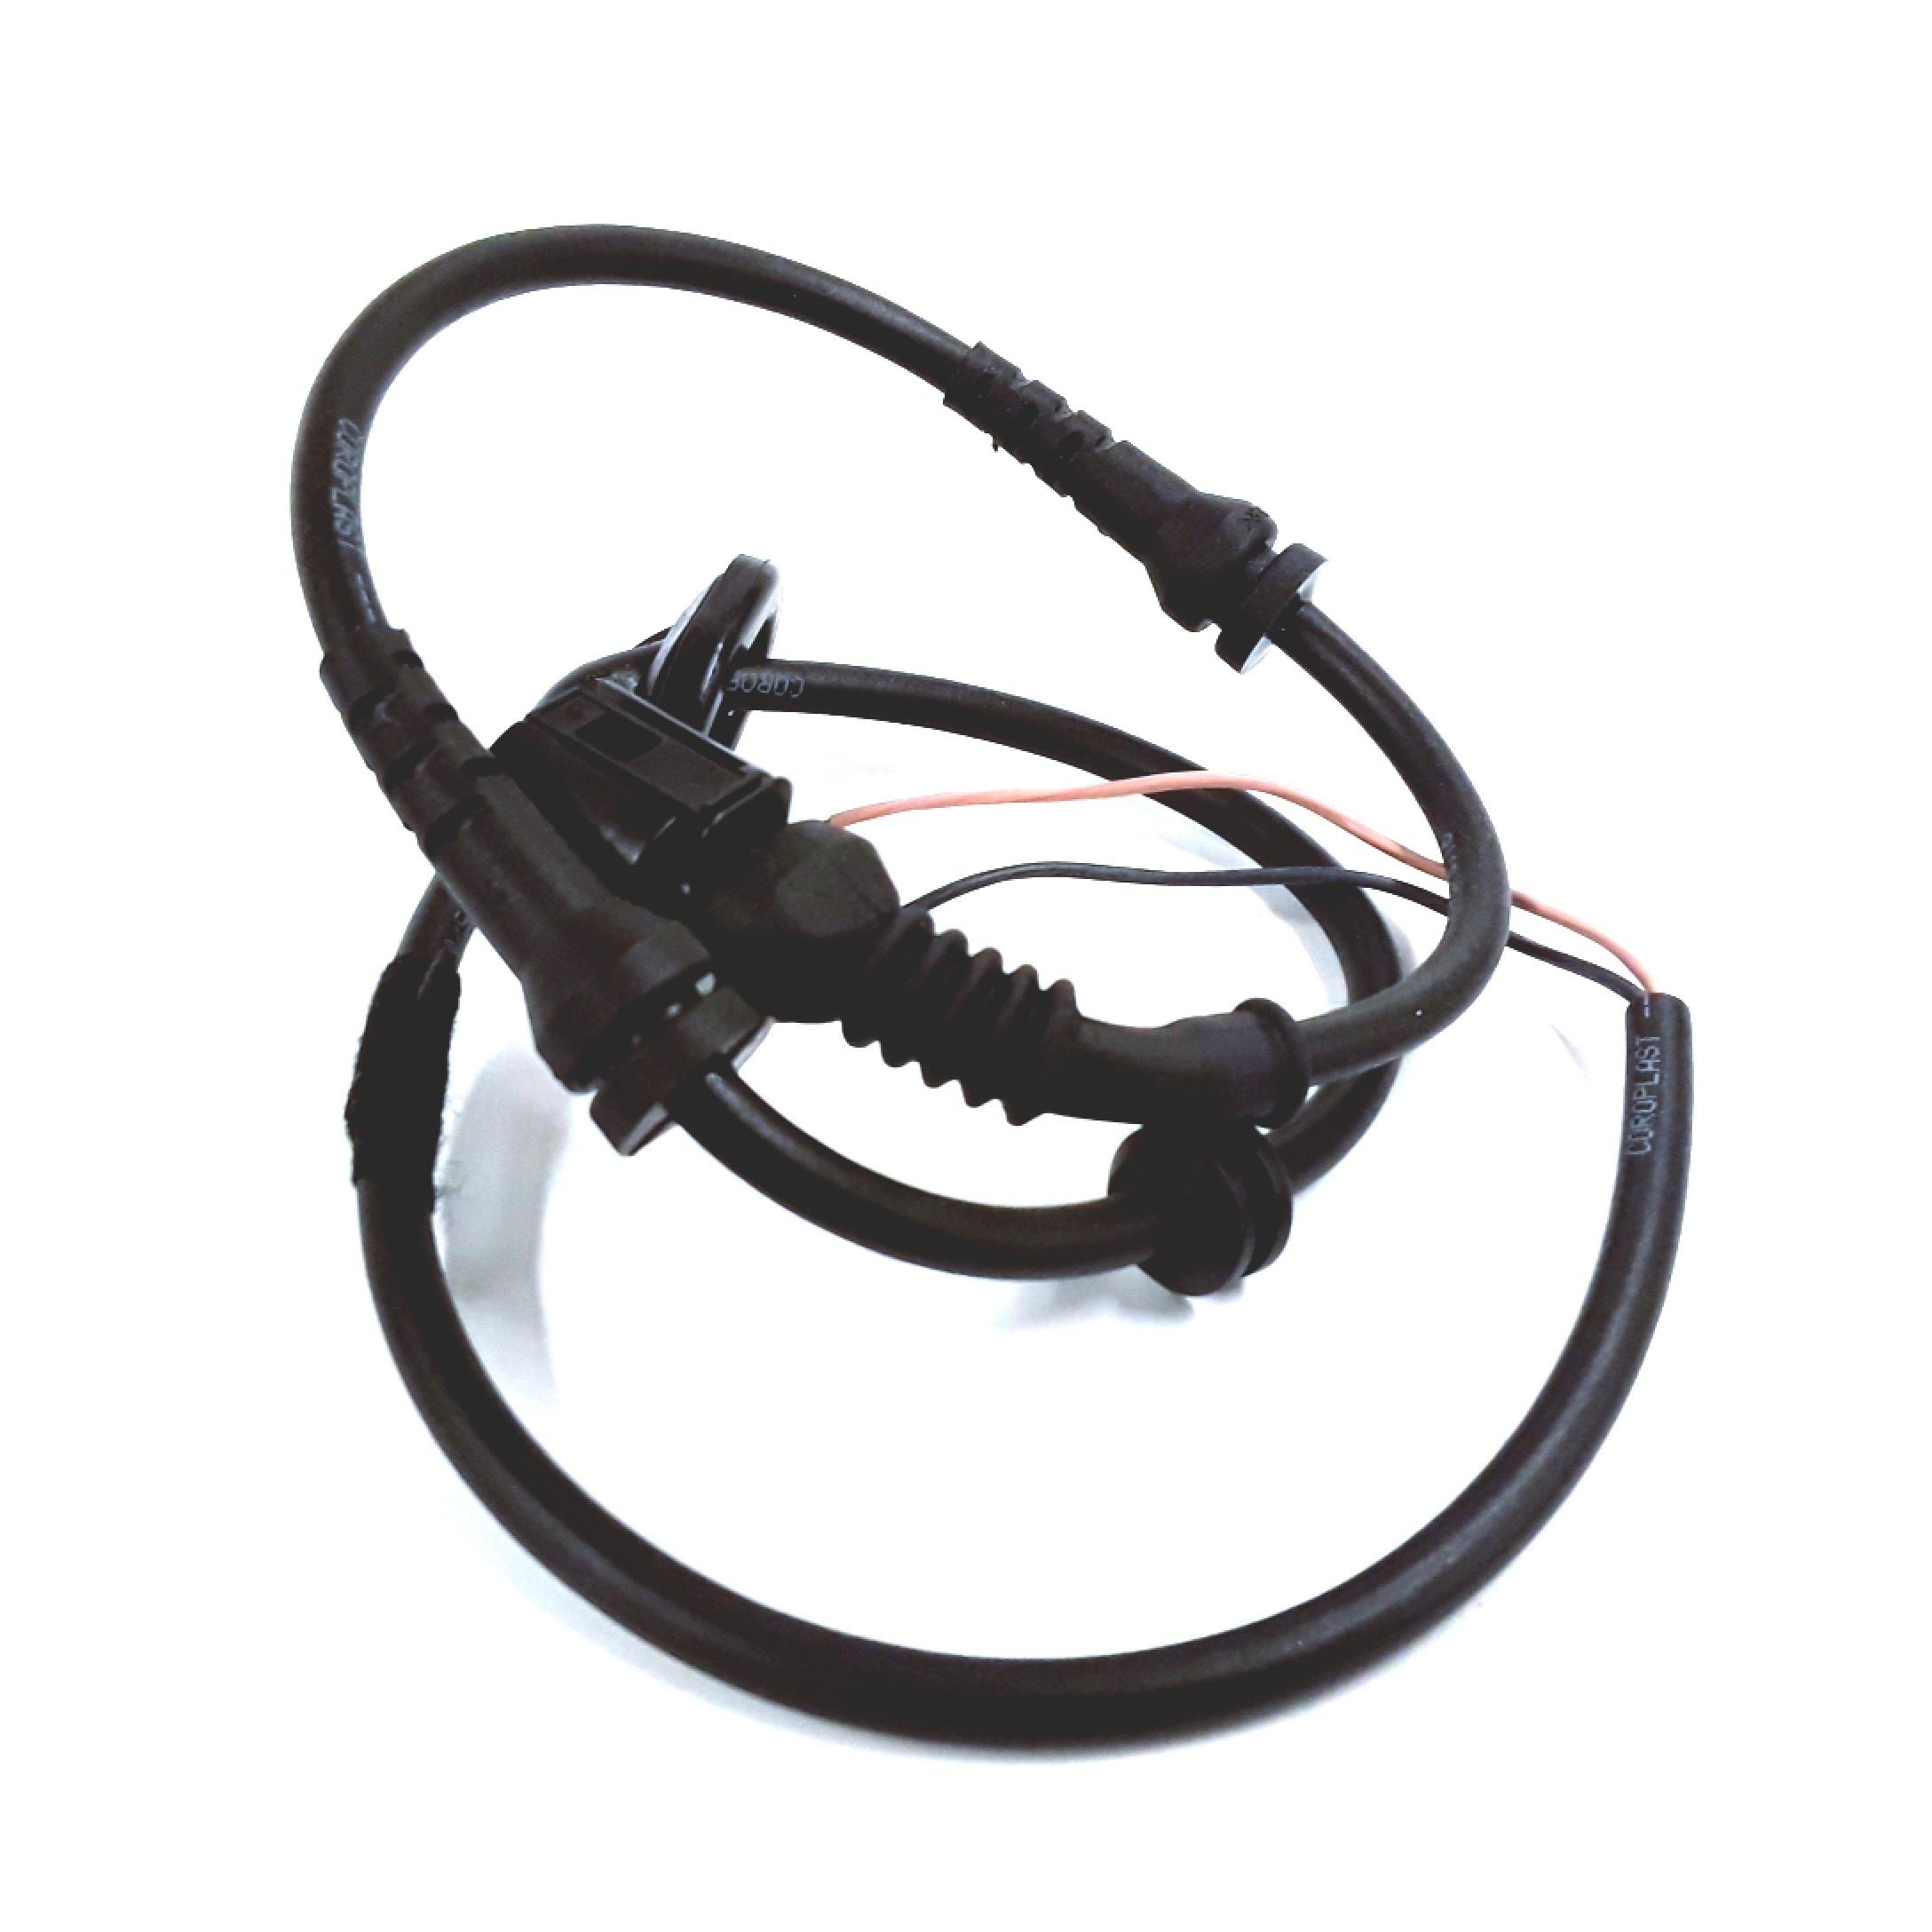 2000 volkswagen beetle abs wheel speed sensor wiring. Black Bedroom Furniture Sets. Home Design Ideas